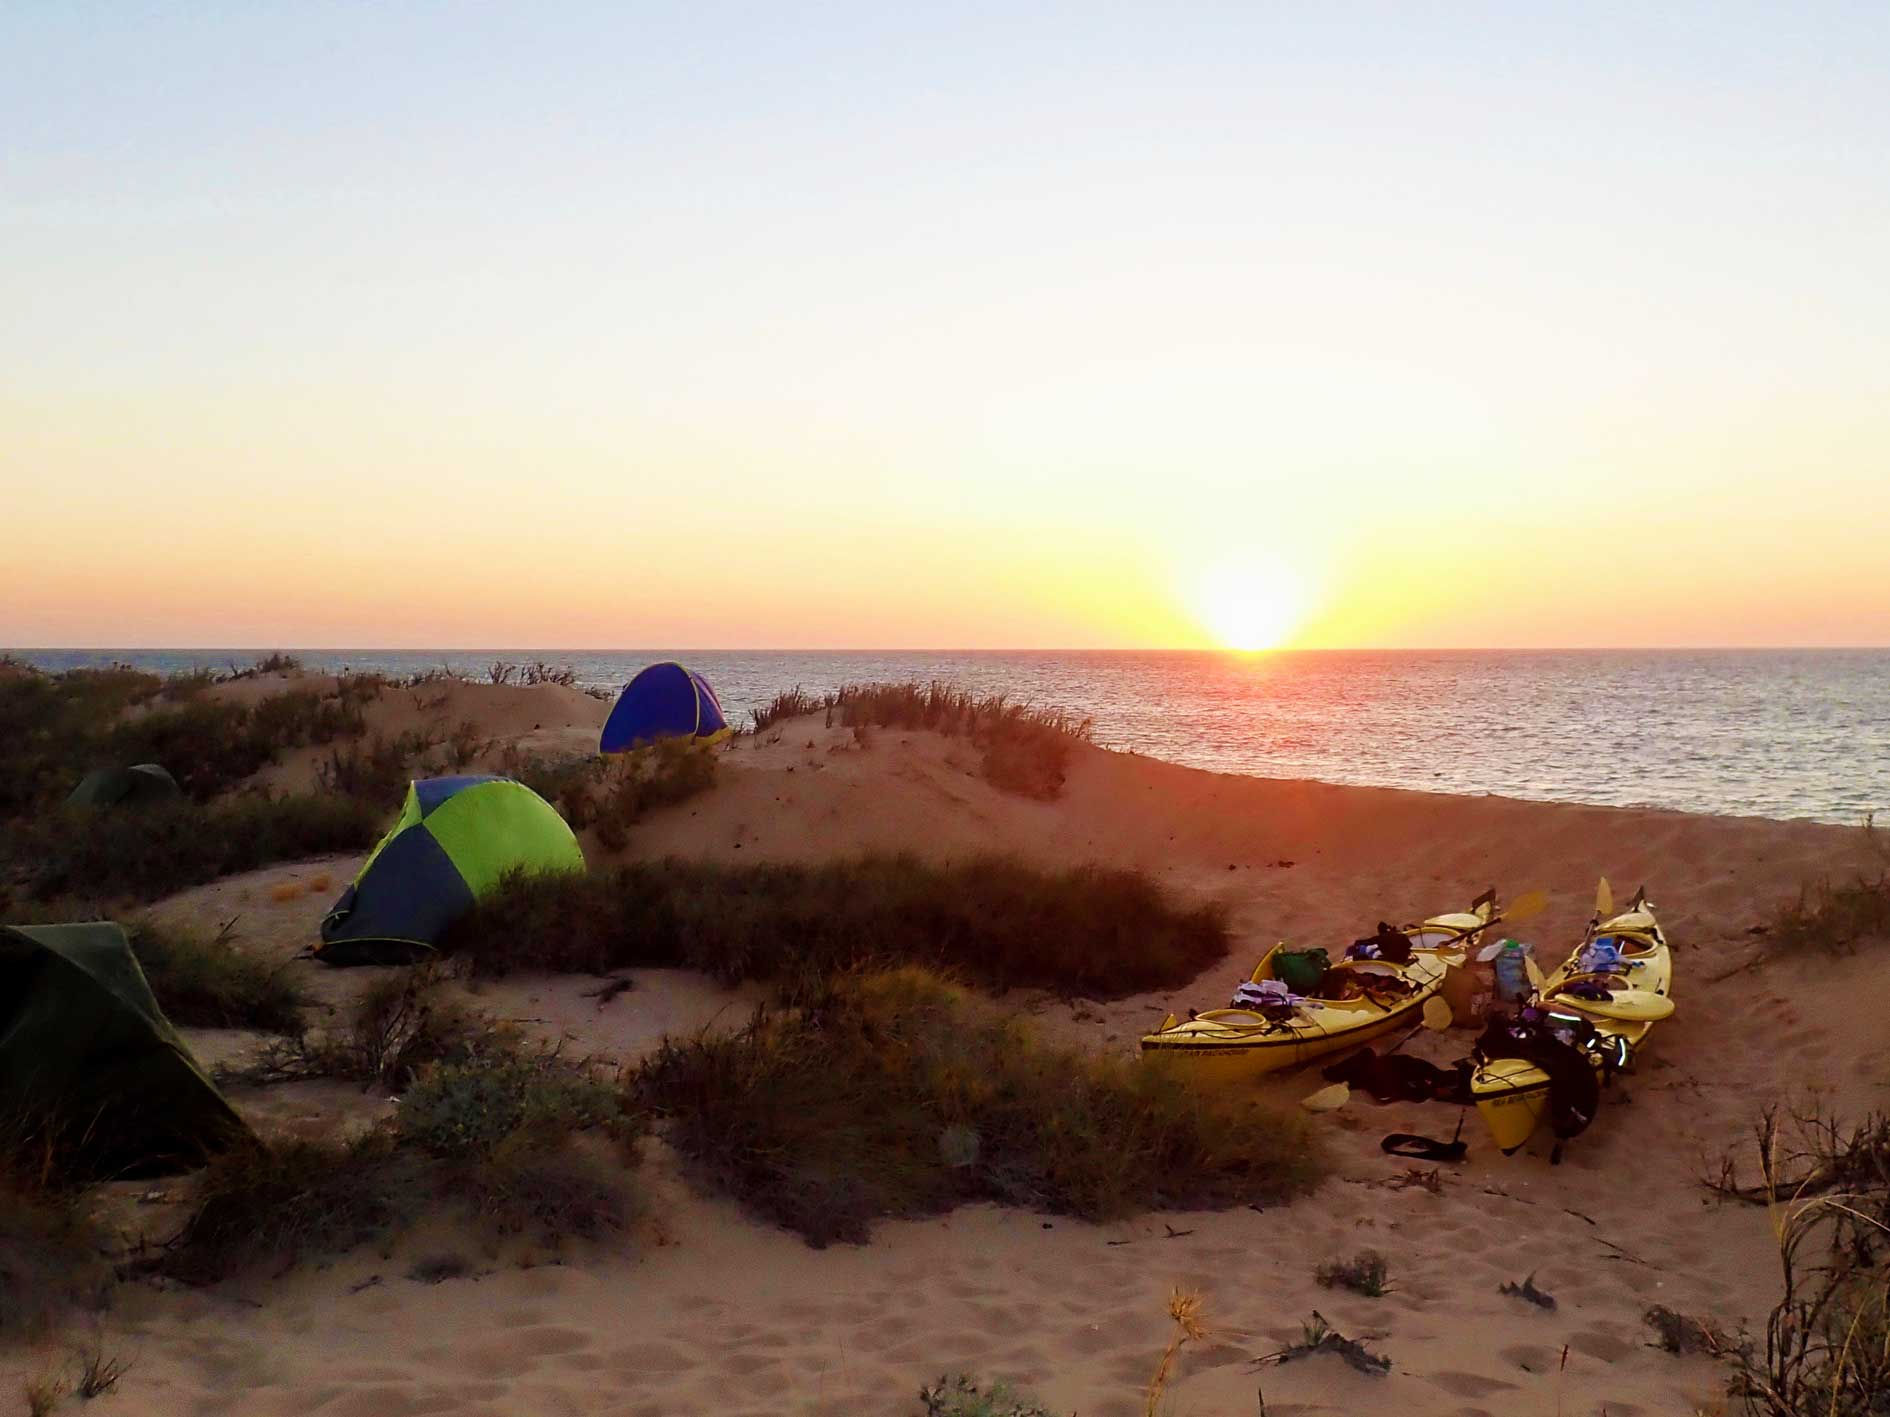 Overnight tours Ningaloo Reef, beach camp at sunset, sea kayaking and snorkelling tour Exmouth, Ningaloo Reef